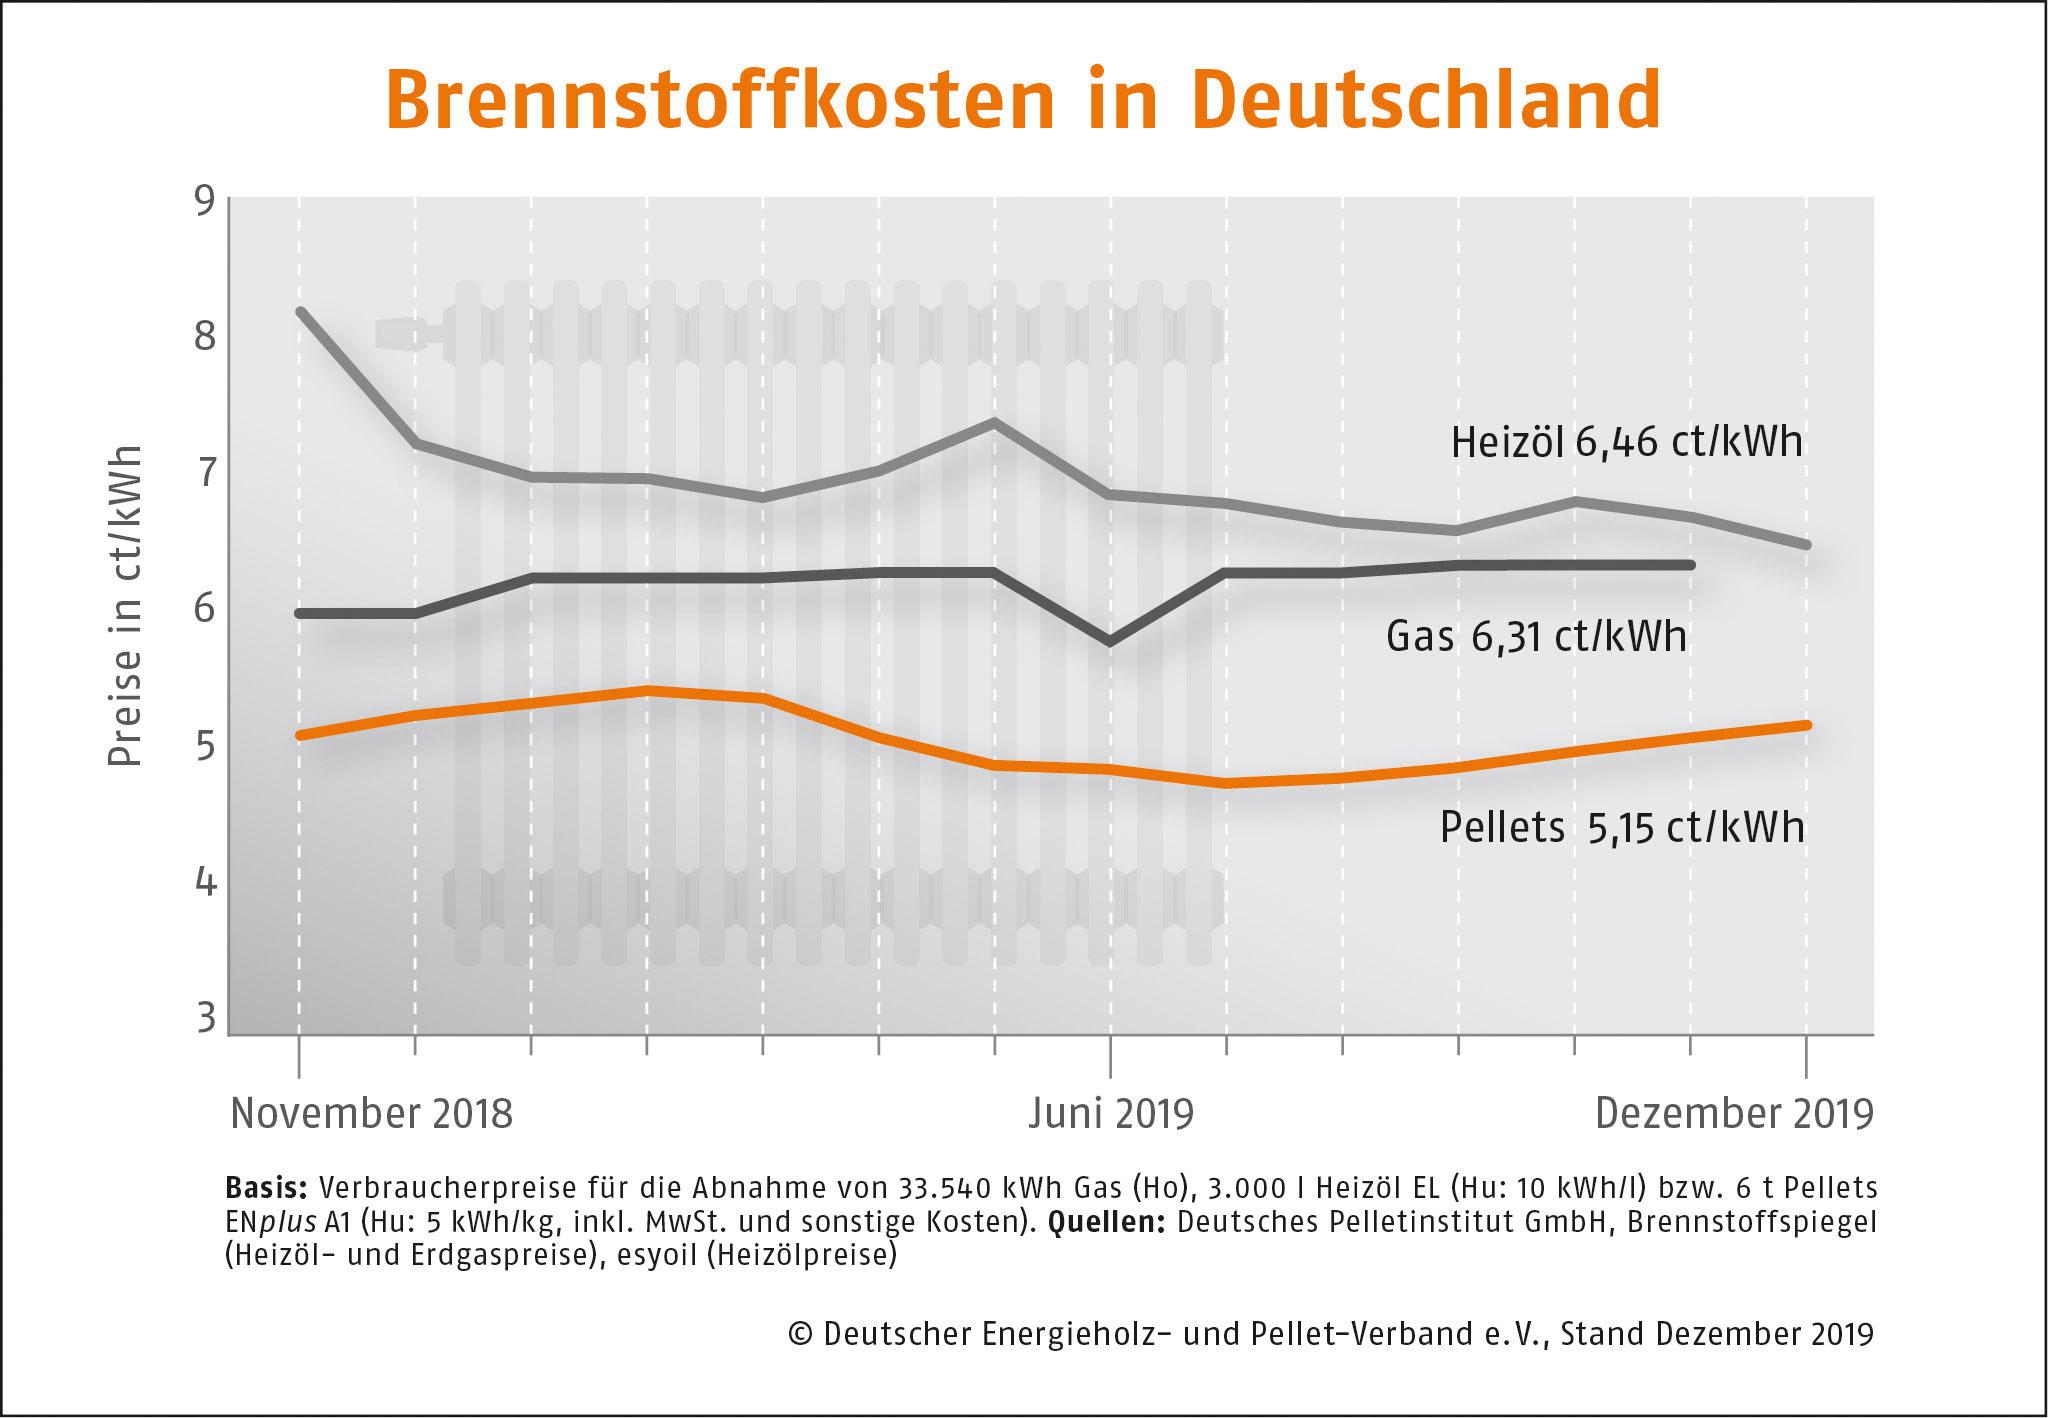 Brennstoffkosten in Deutschland DEPI Brennstoffkosten November 191216